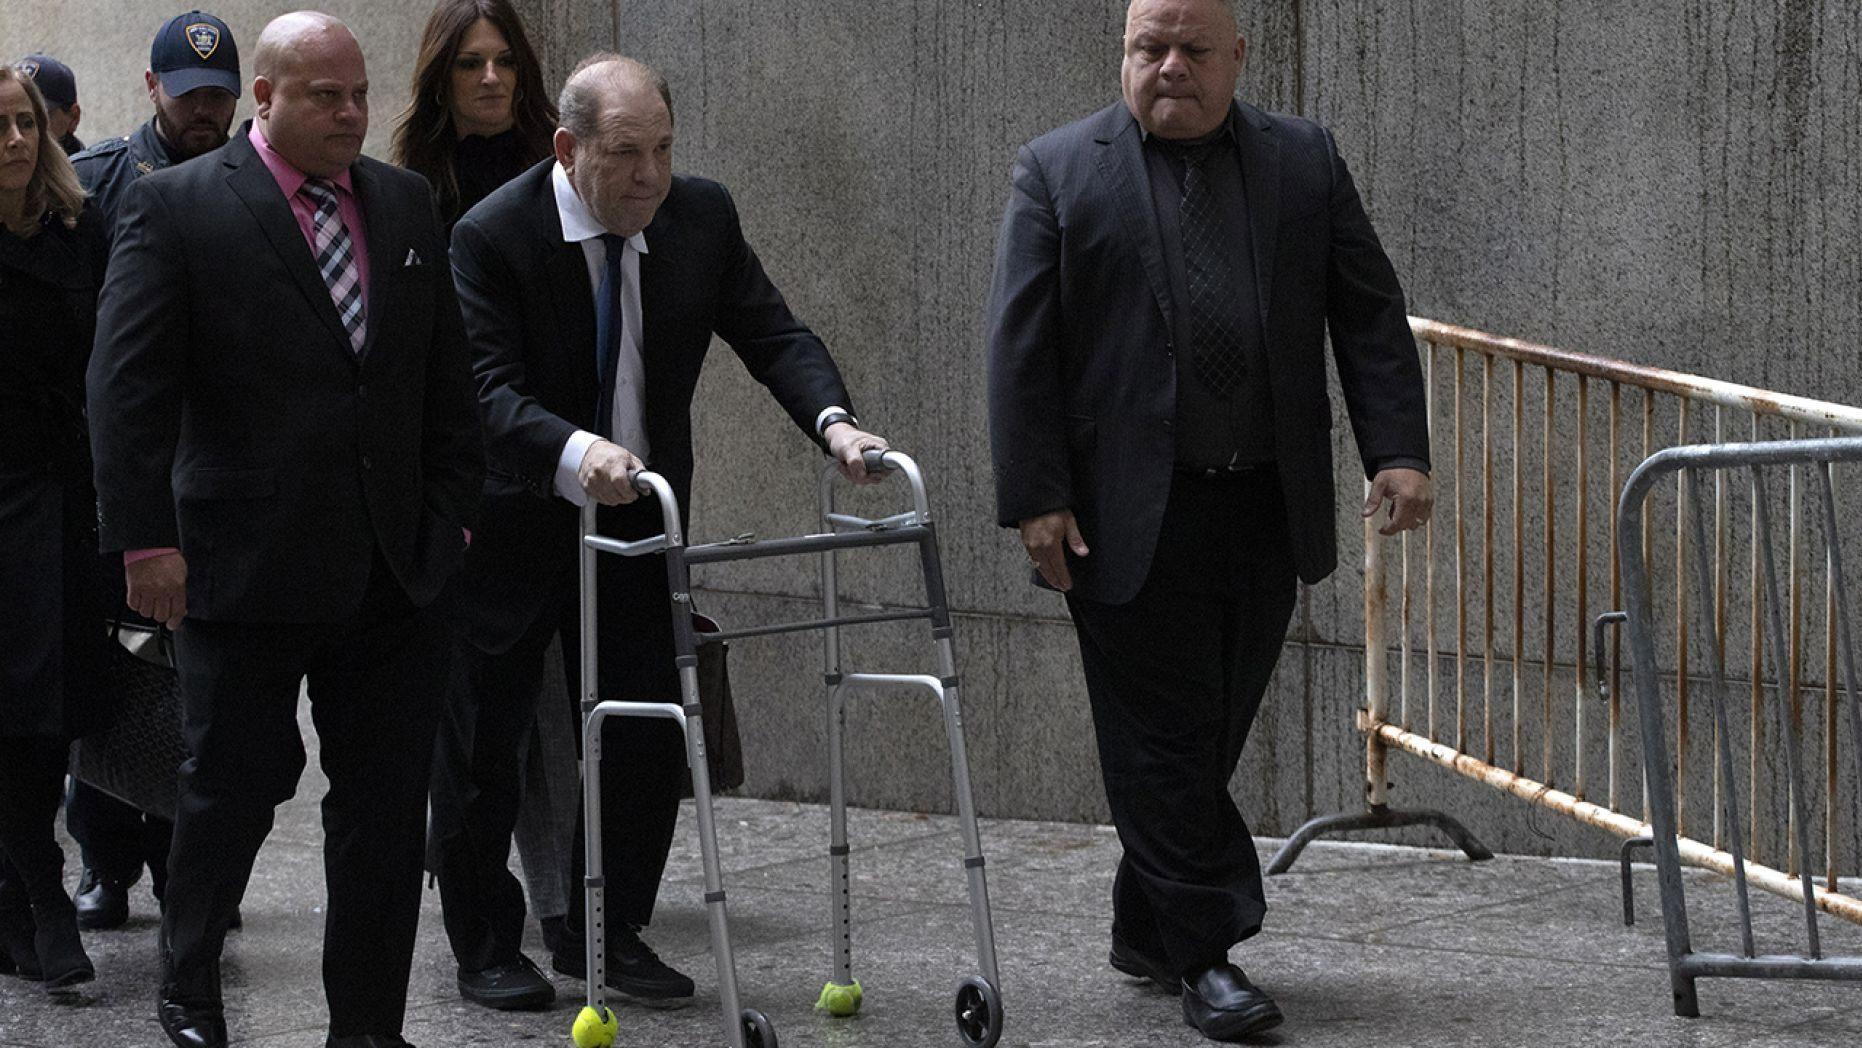 Harvey Weinstein, center, arrives for a court hearing, Wednesday, Dec. 11, 2019 in New York.